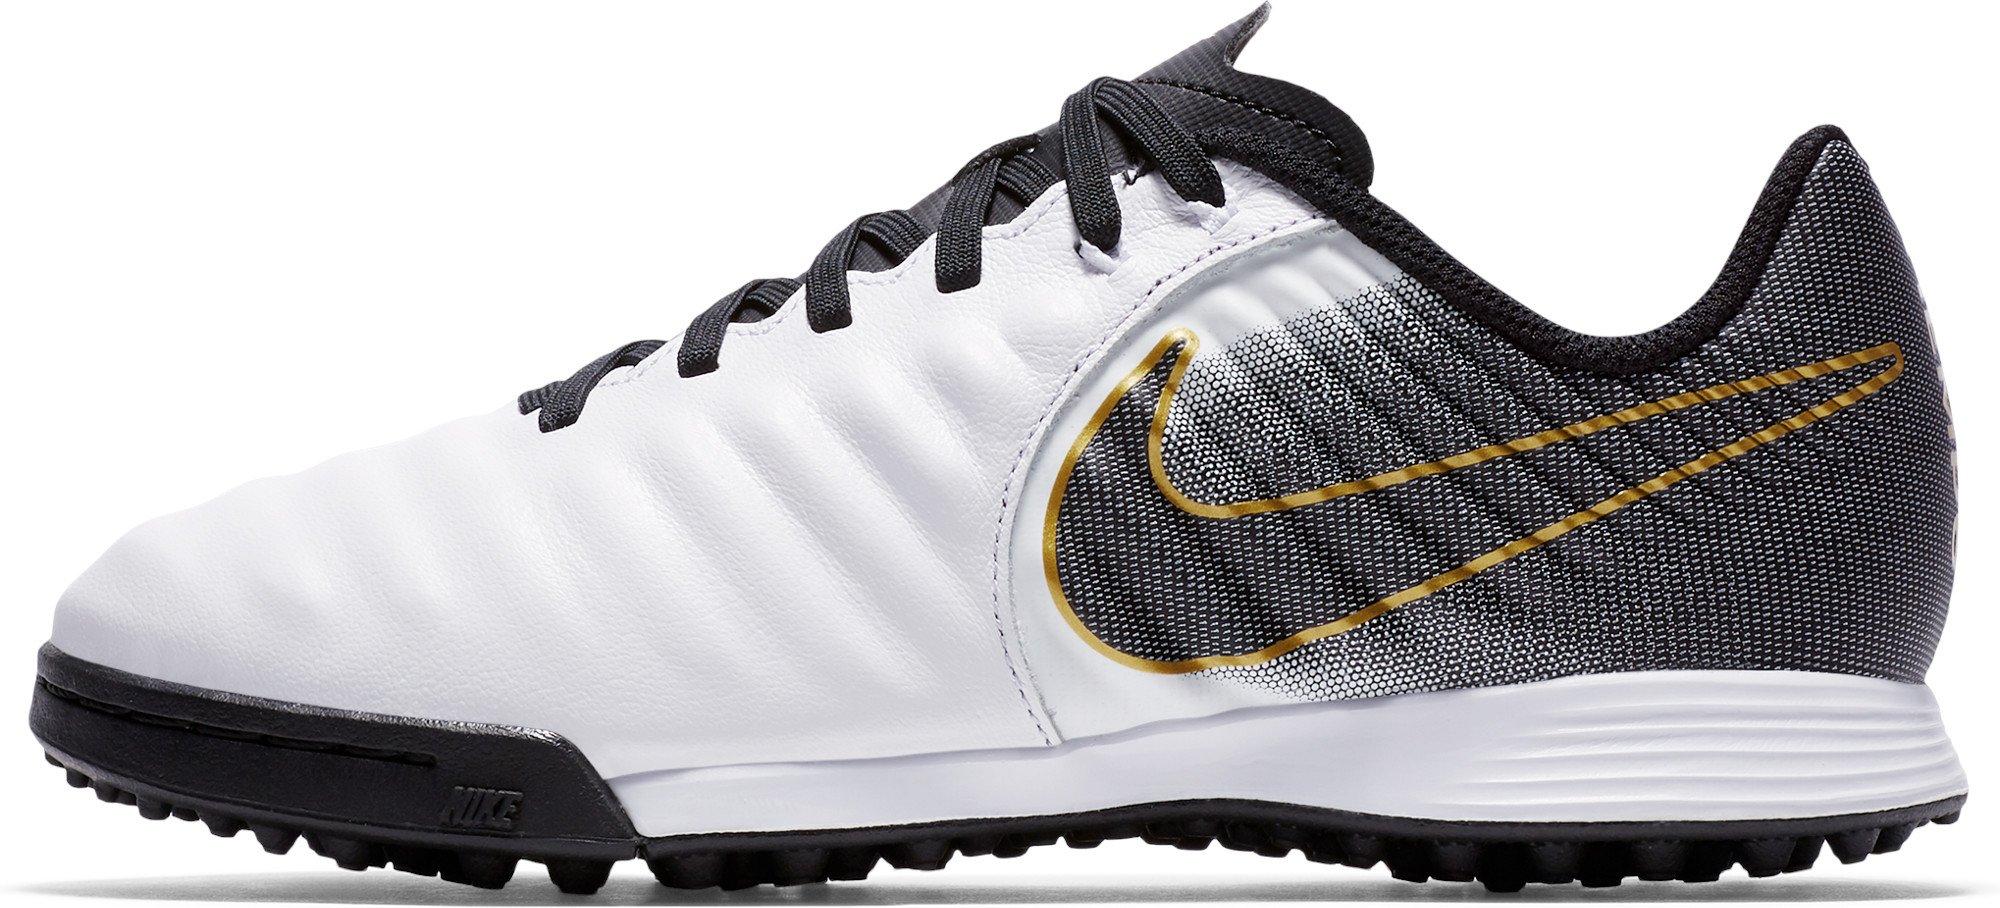 aburrido El camarero Discriminar  Football shoes Nike Jr. Tiempo Legend VII Academy TF - Top4Football.com